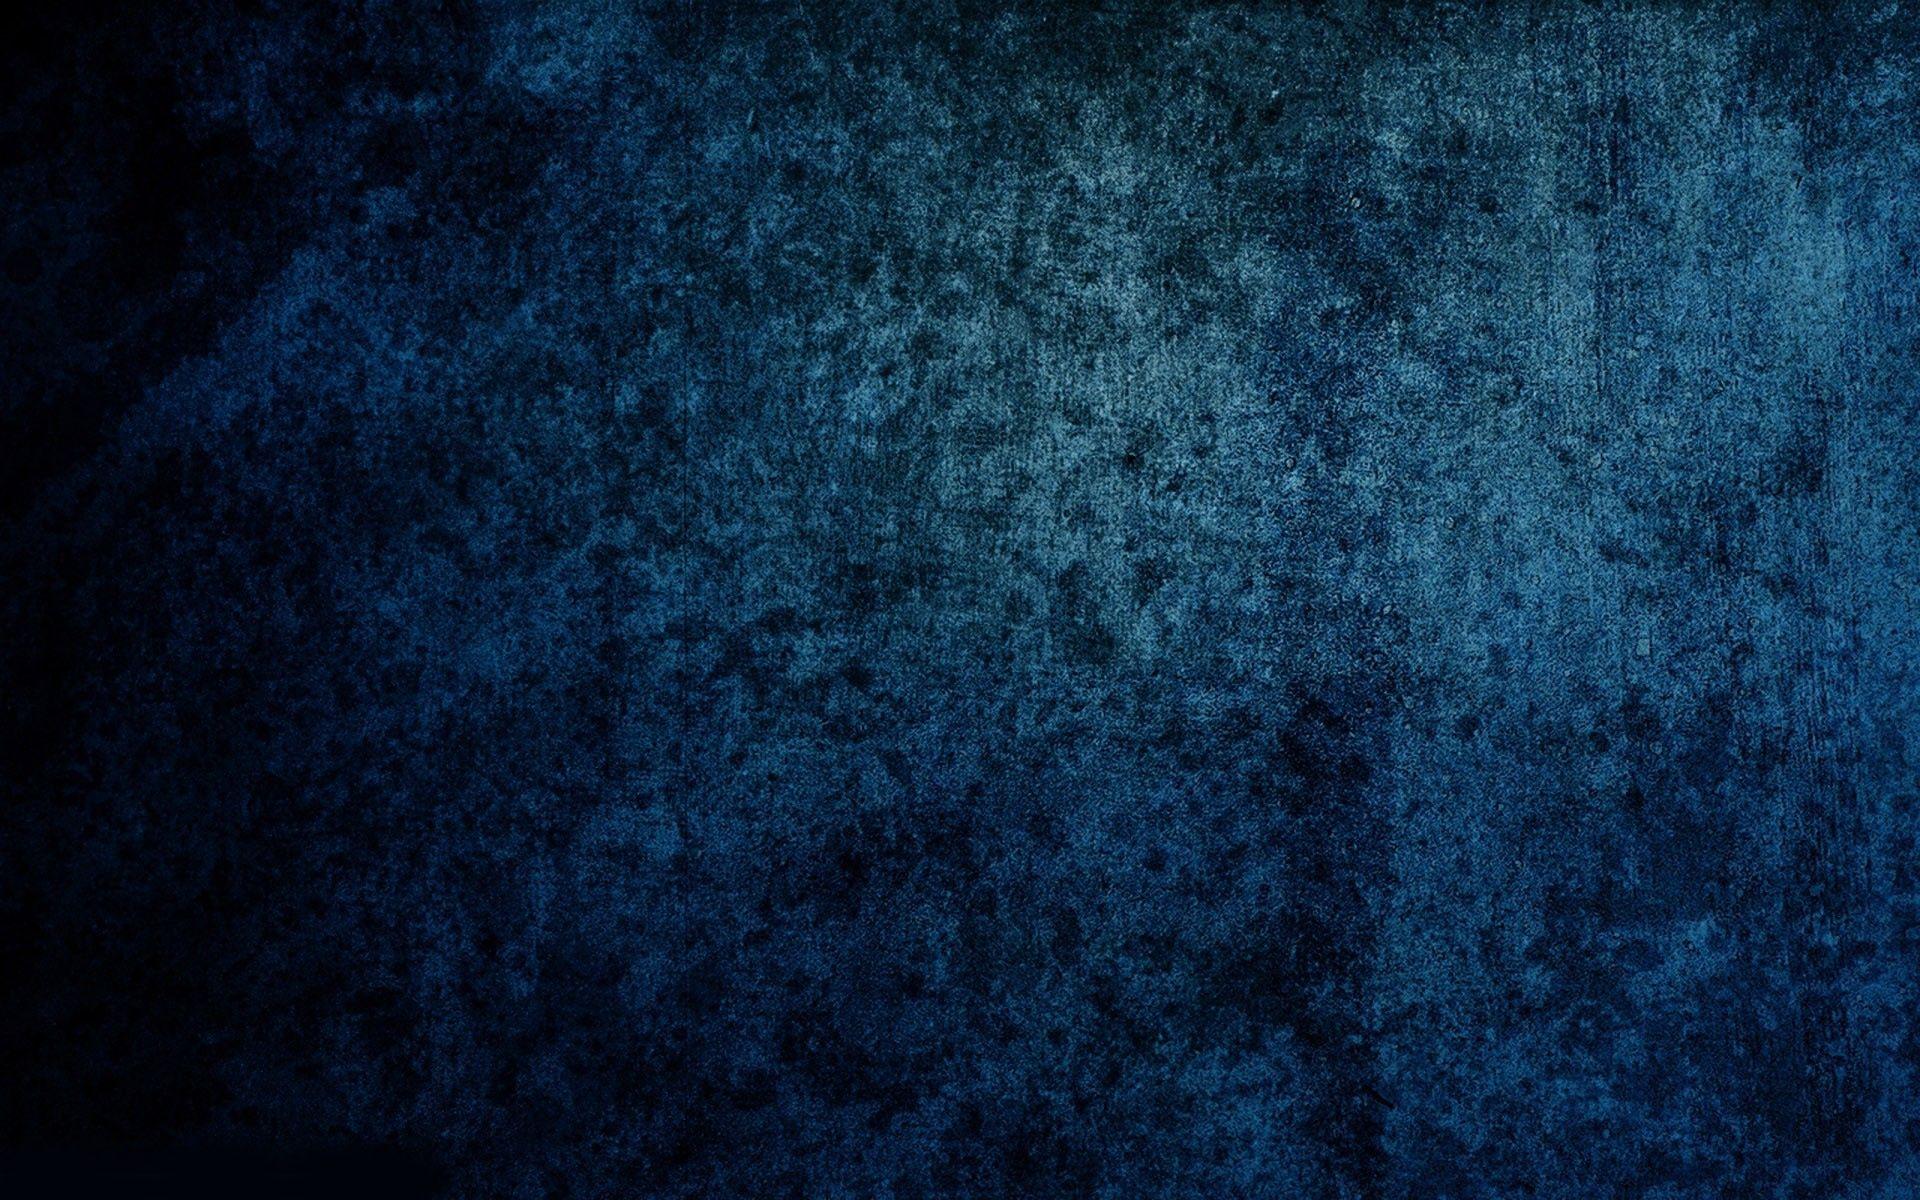 tumblr leopard background wallpaper 1800a—1200 grunge desktop wallpapers 27 wallpapers adorable